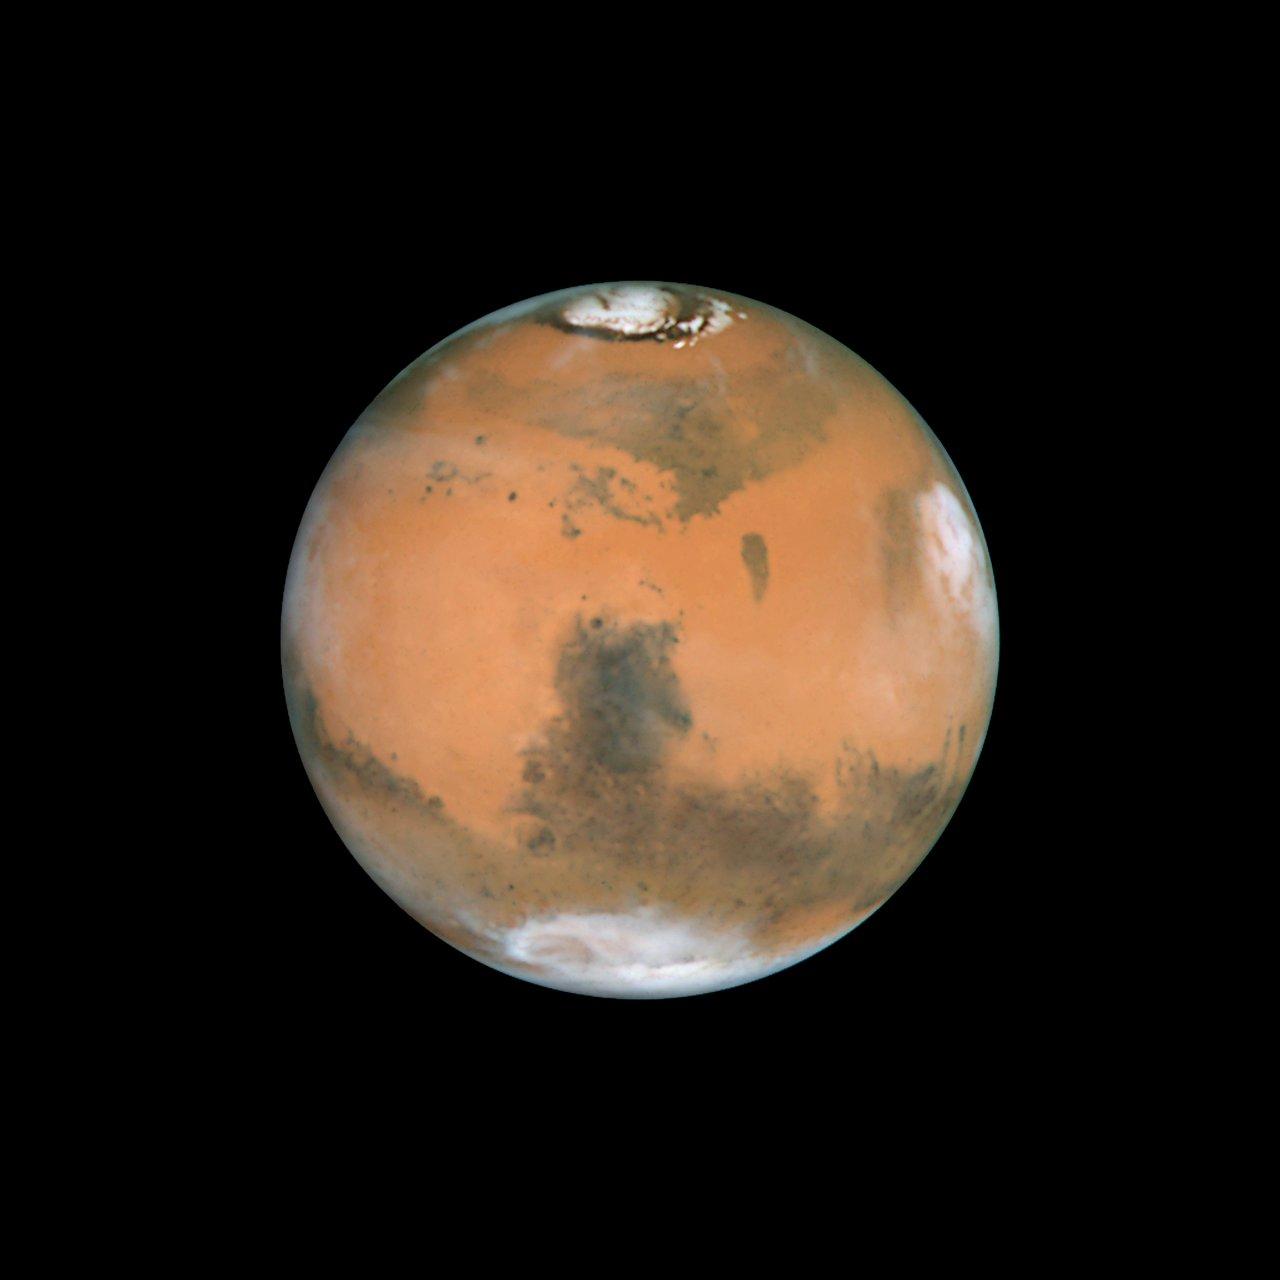 Mars Near Opposition 1995-2005: 1999